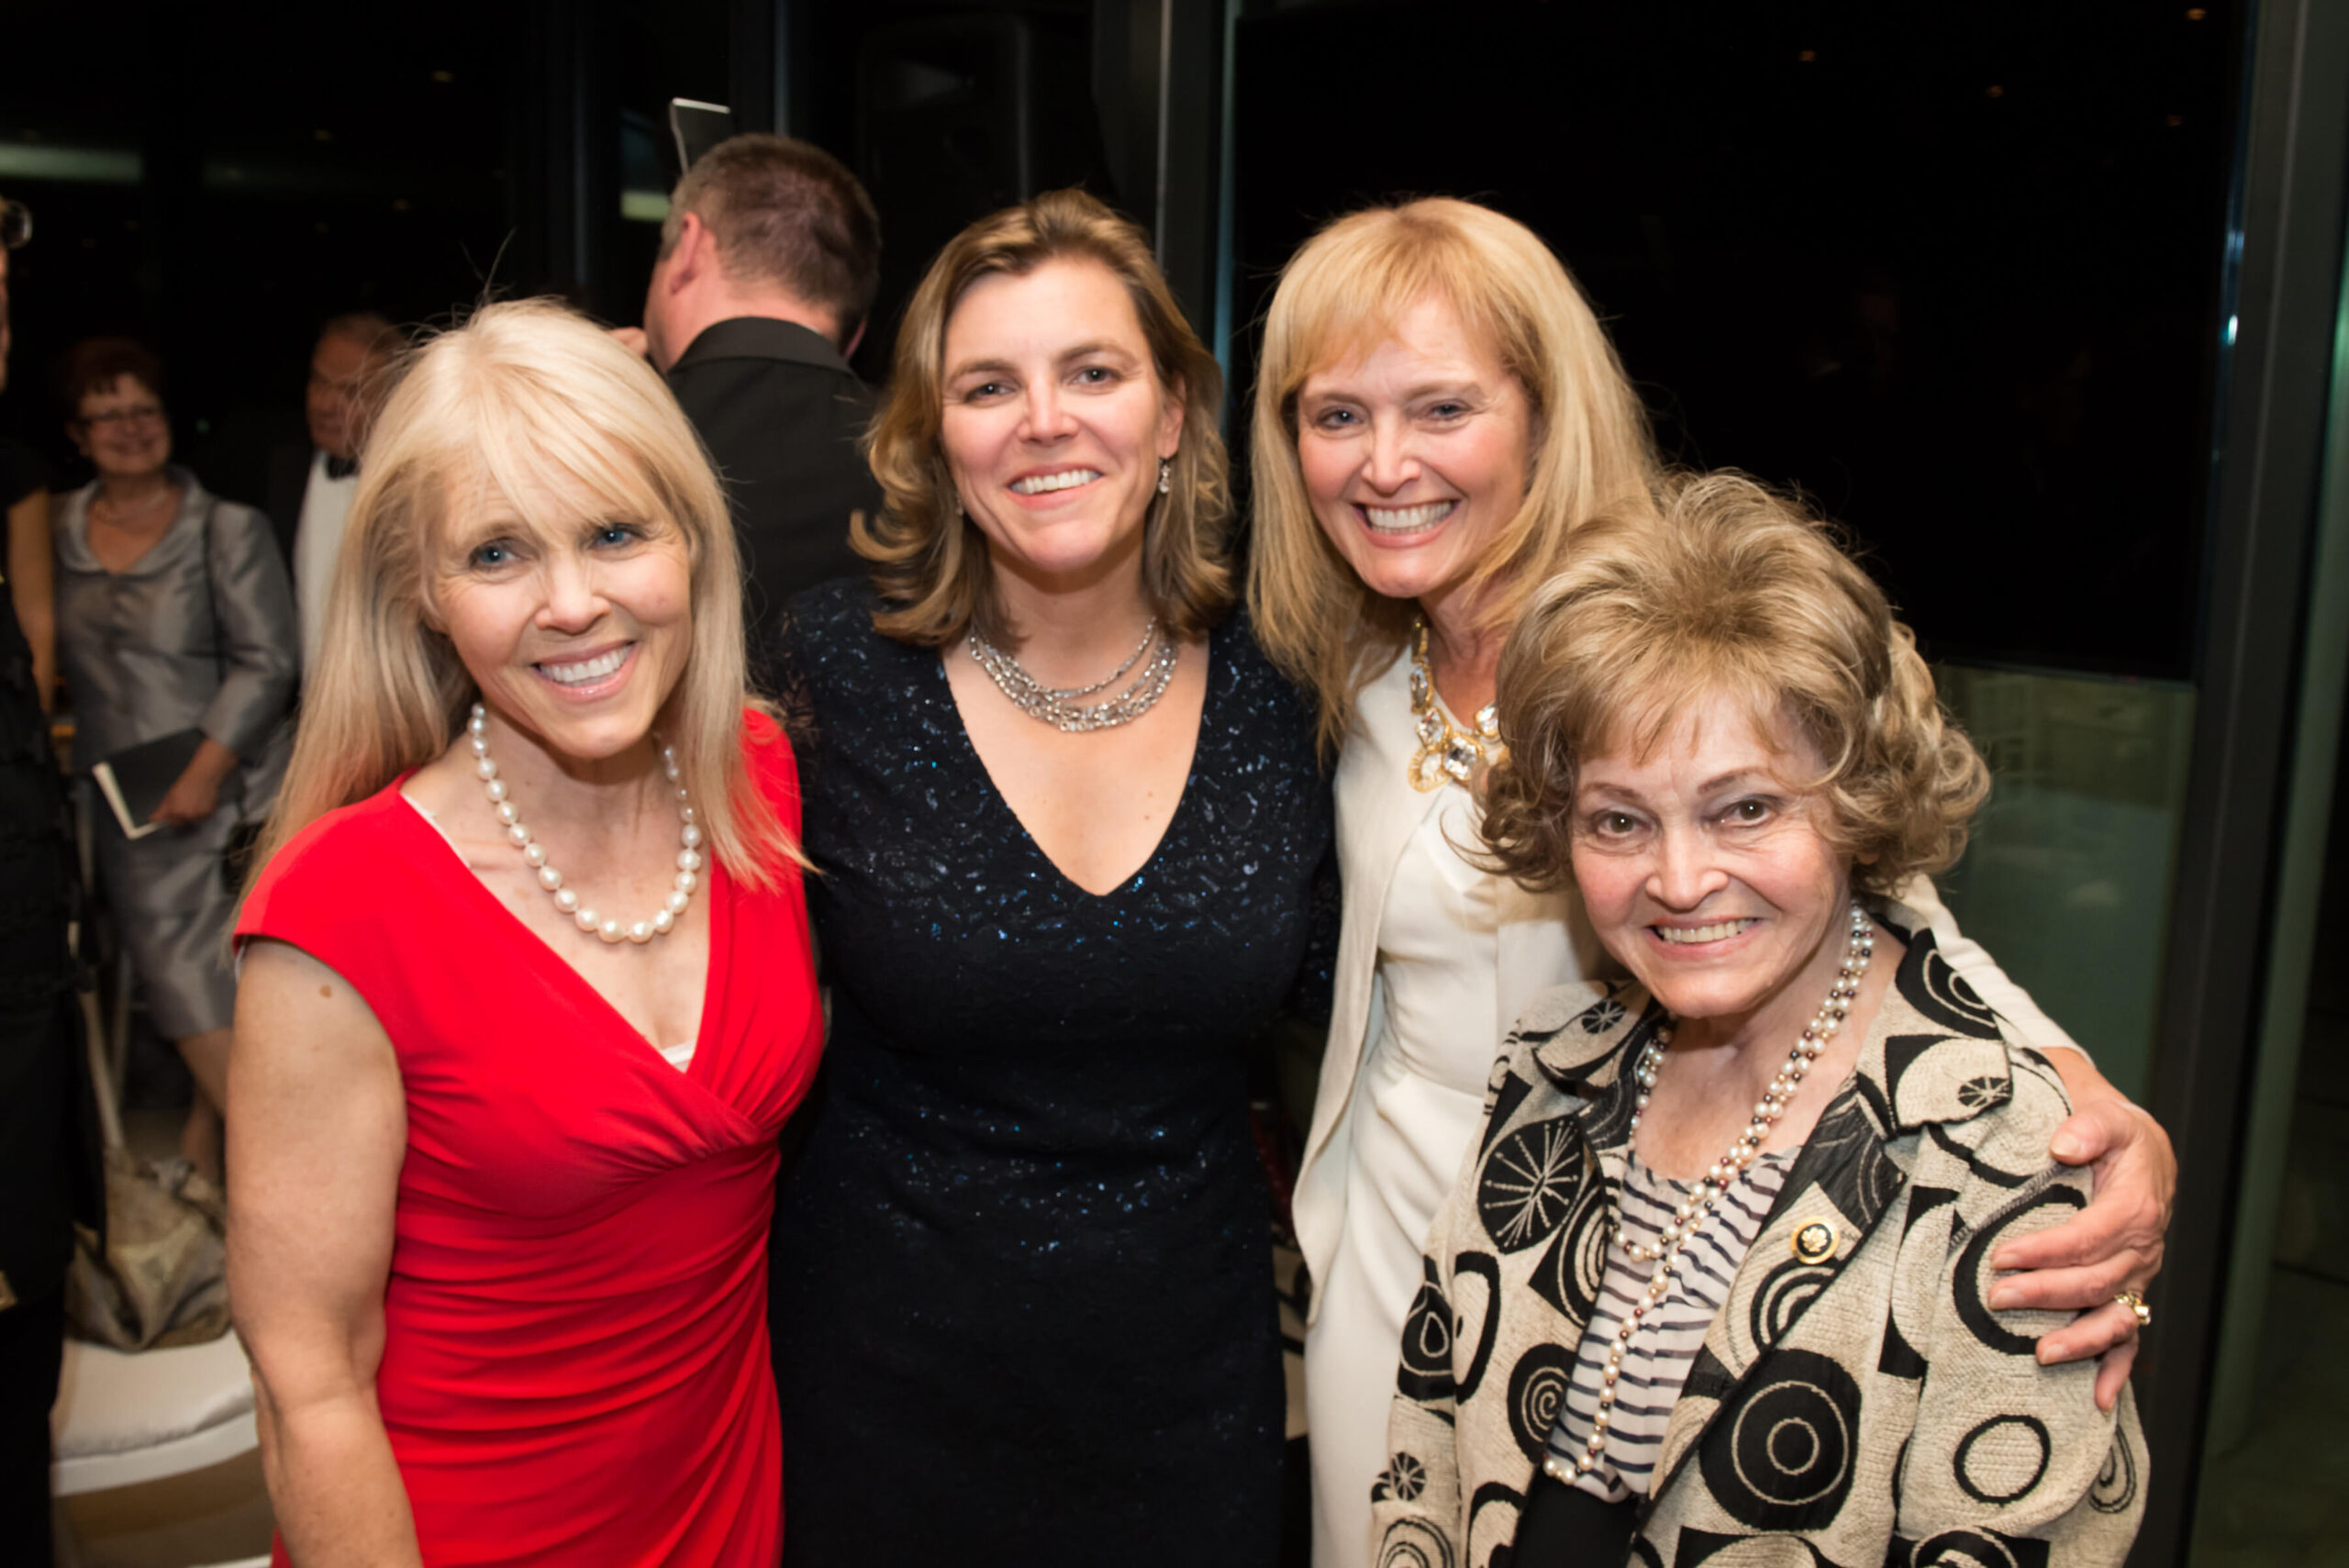 Mrs. Anette Tillemann-Dick, Mrs. Andrea Lauer Rice, Mrs. Katrina Lantos Swett, Mrs. Anette Lantos